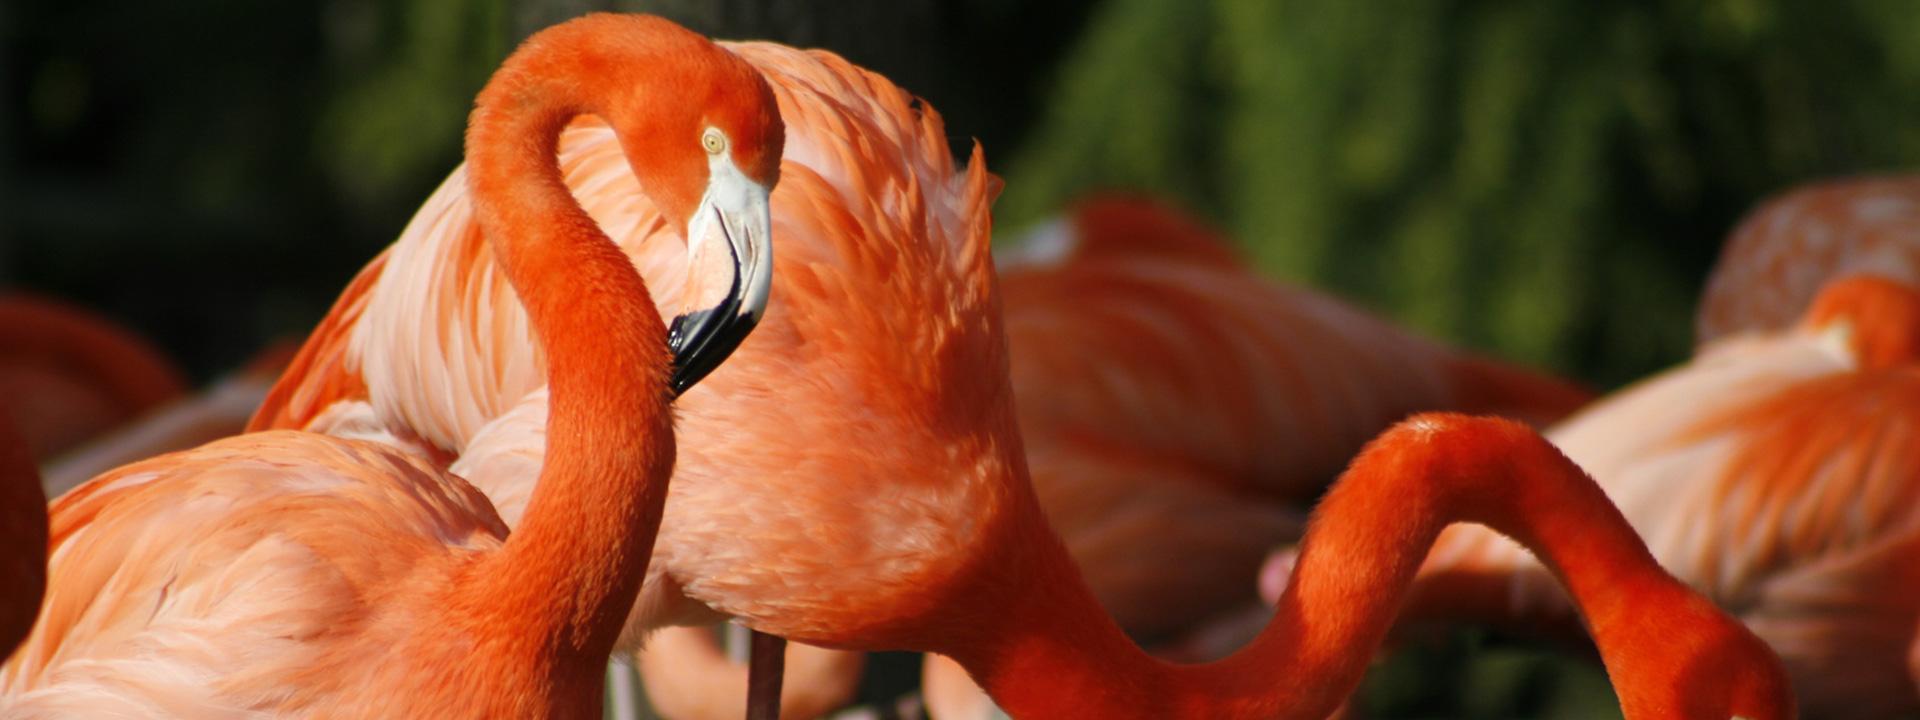 10 curiosidades sobre los flamencos